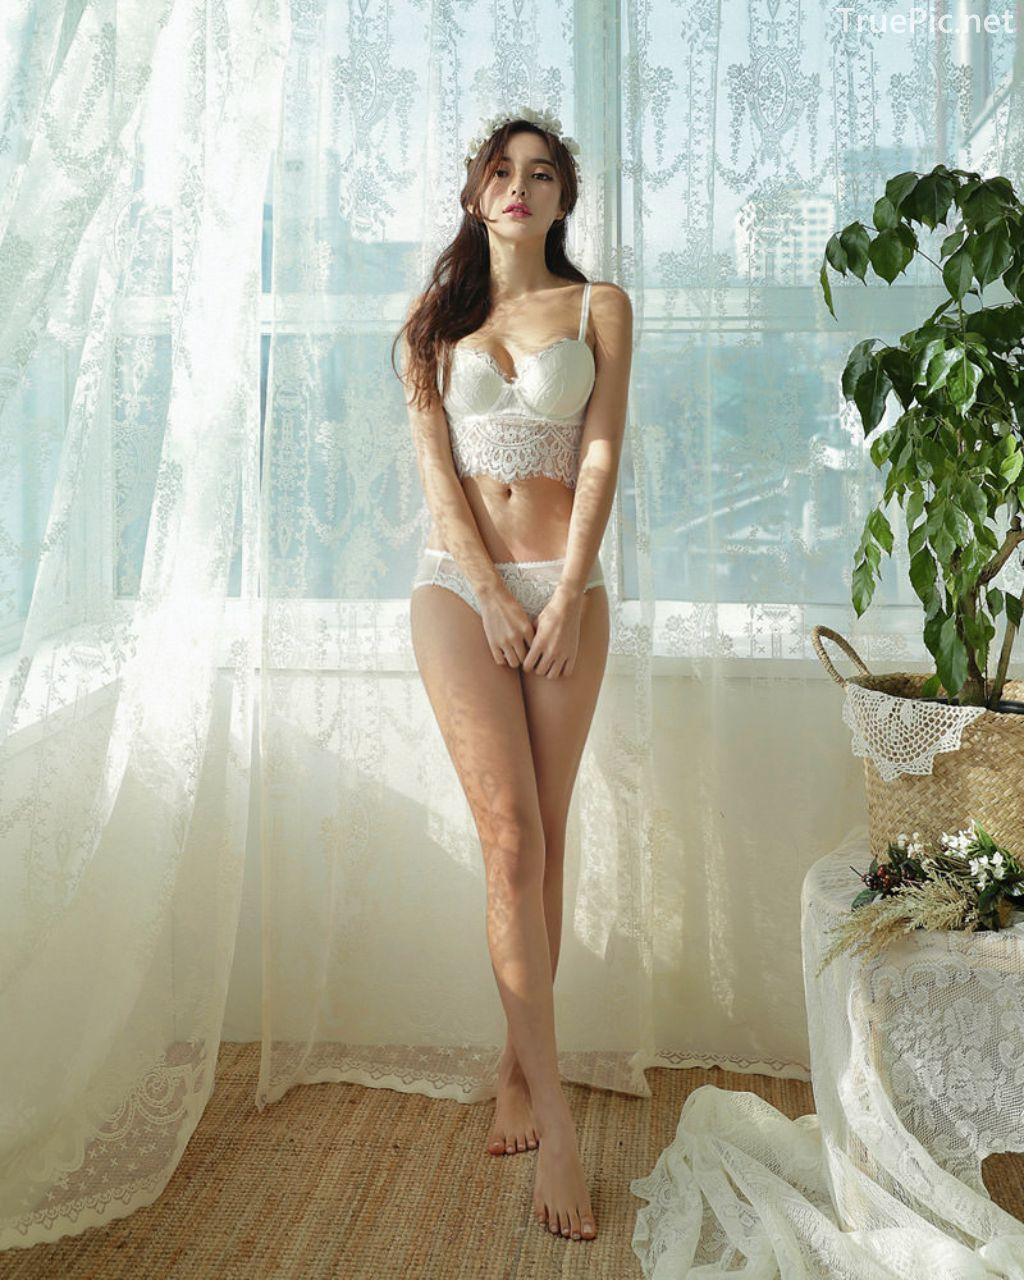 Korean Fashion Model - Jin Hee - Lovely Soft Lace Lingerie - TruePic.net - Picture 8